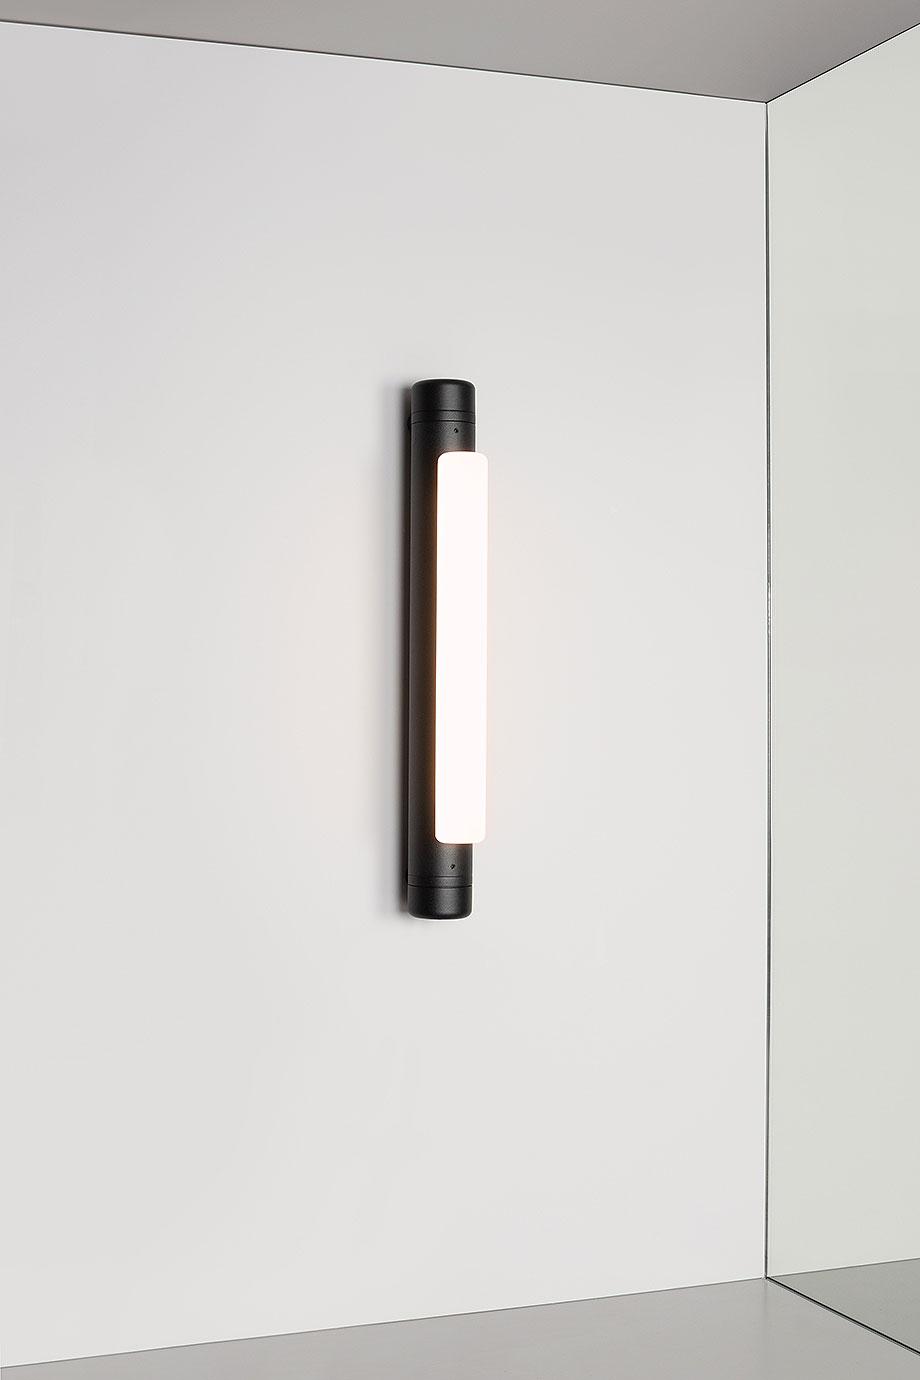 sistema modular de iluminacion pipeline de caine heintzmen y andlight (6)